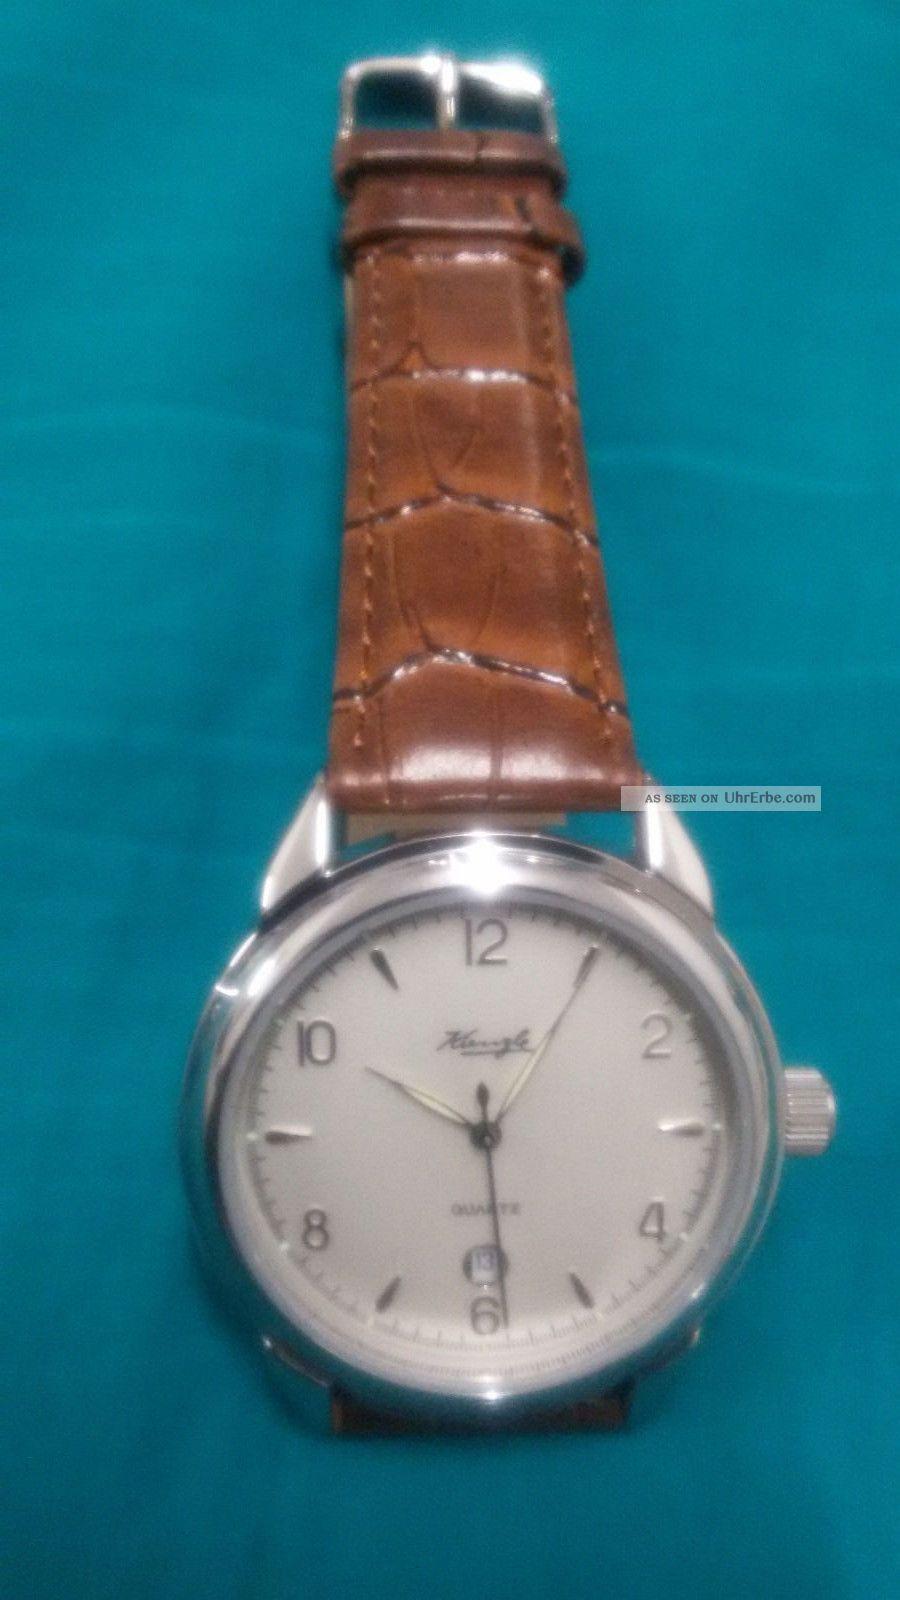 Uhr,  Kienzle Herrenarmband Uhr Armbanduhren Bild